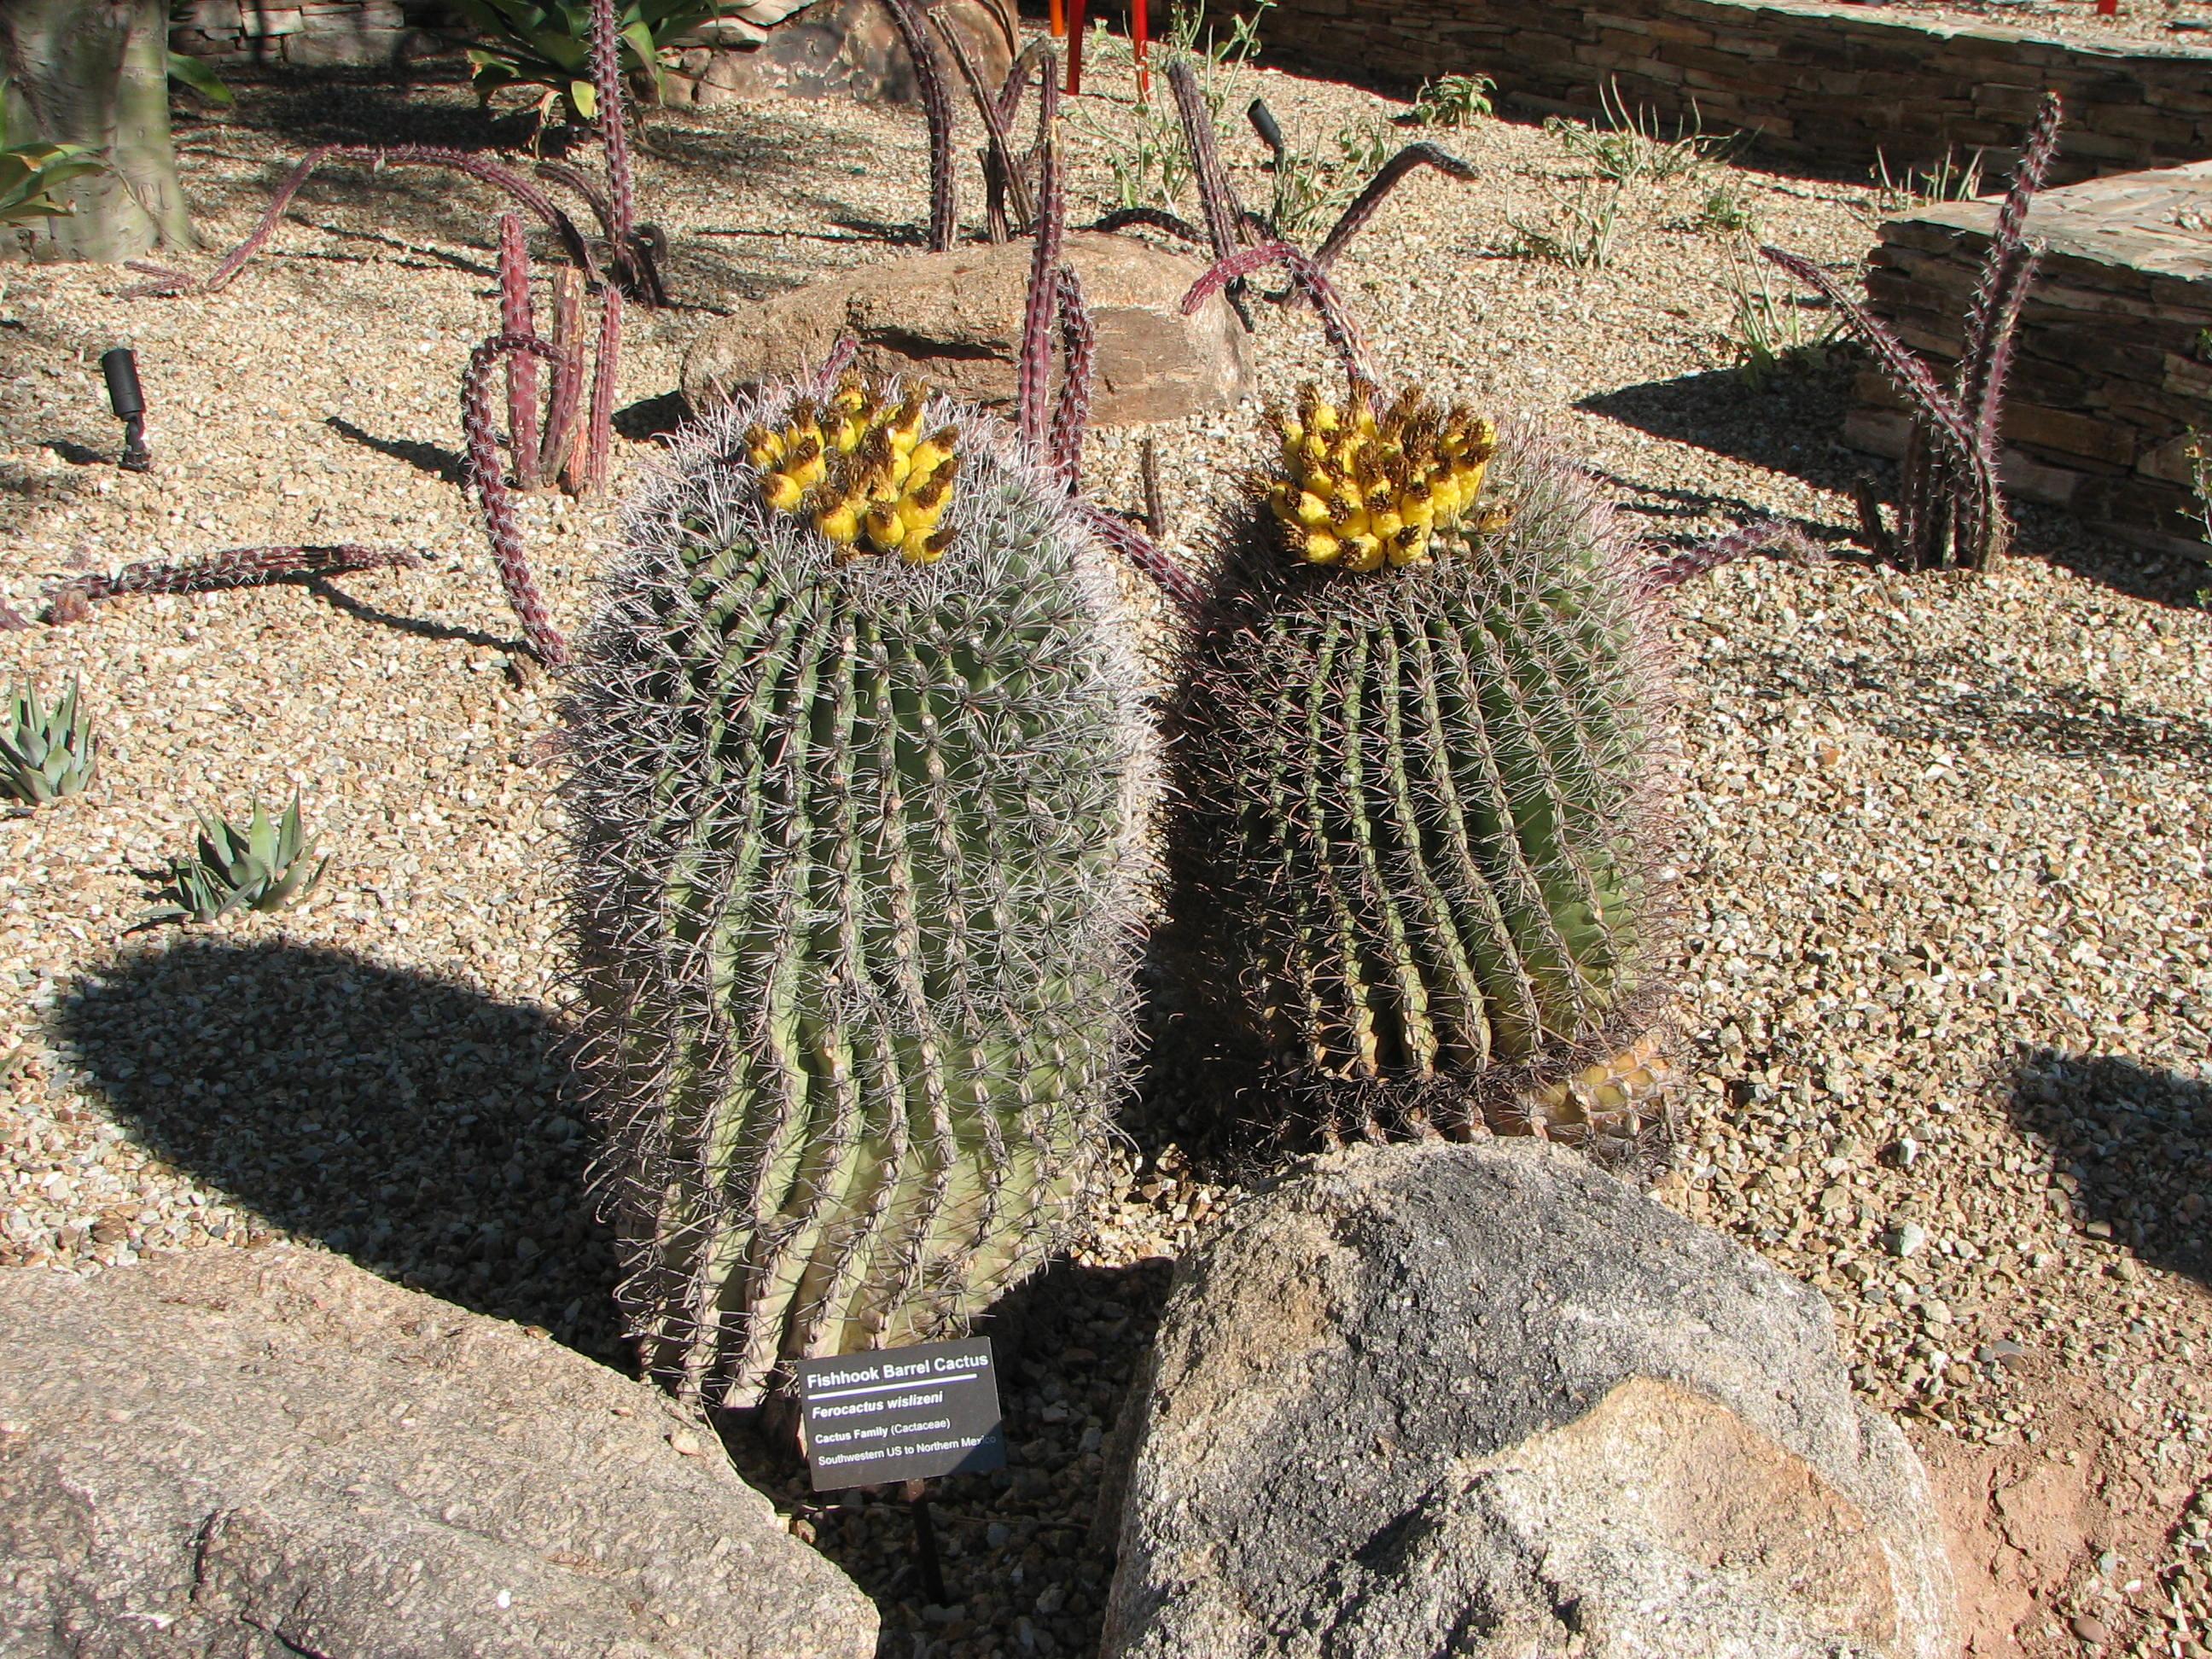 Fichier:Fishhook Barrel Cactus.jpg — Wikipédia